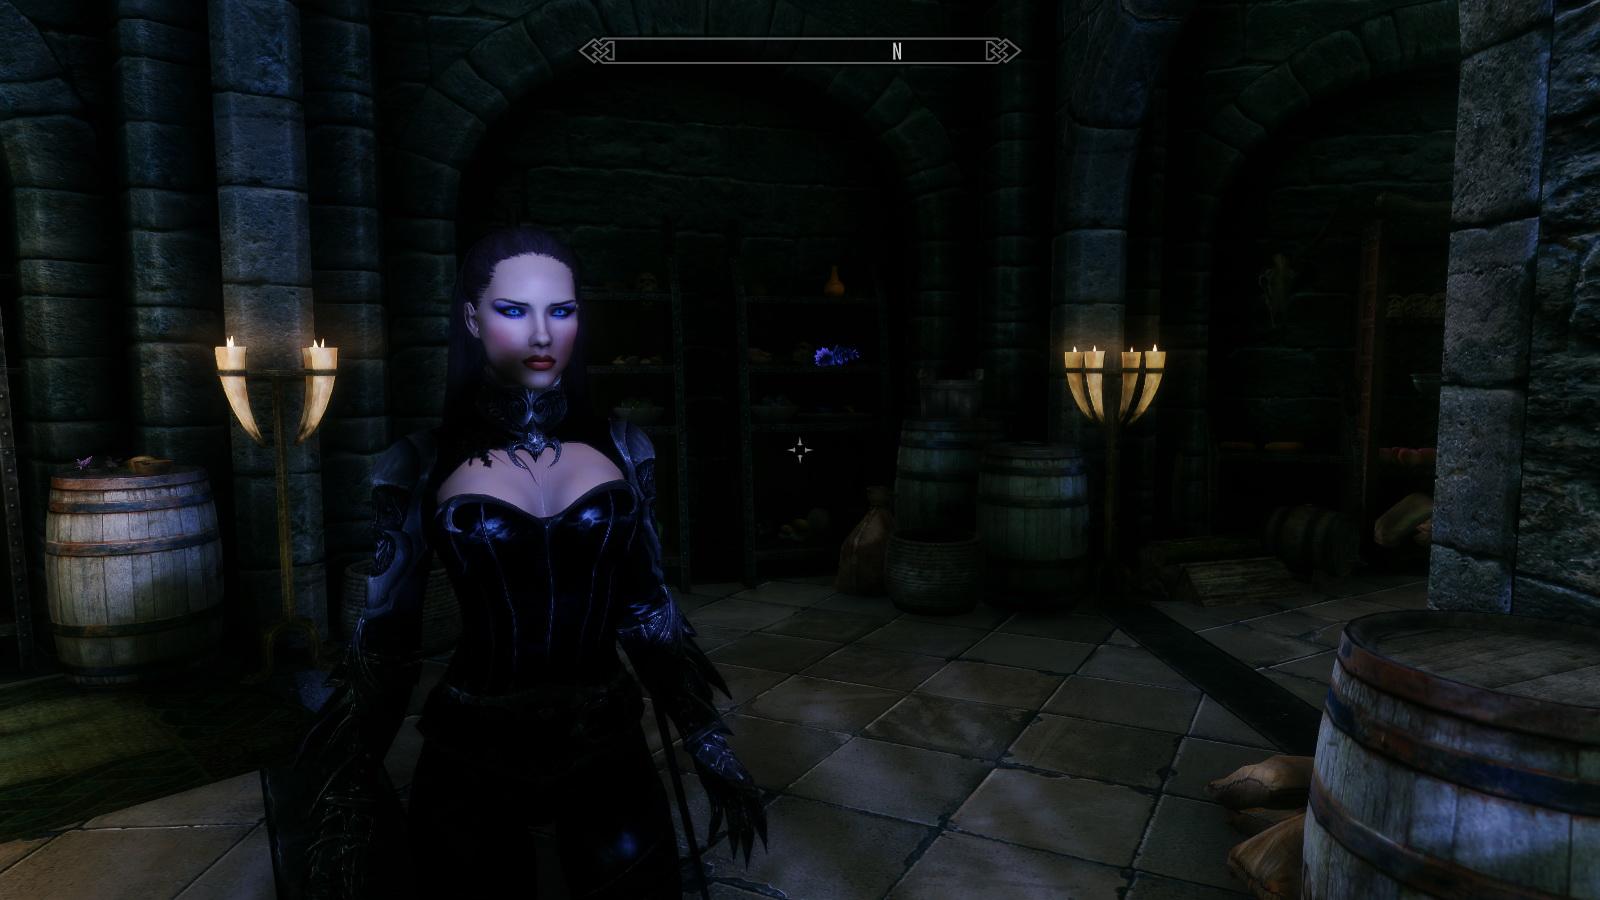 ScreenShot37 (2).jpg - Elder Scrolls 5: Skyrim, the